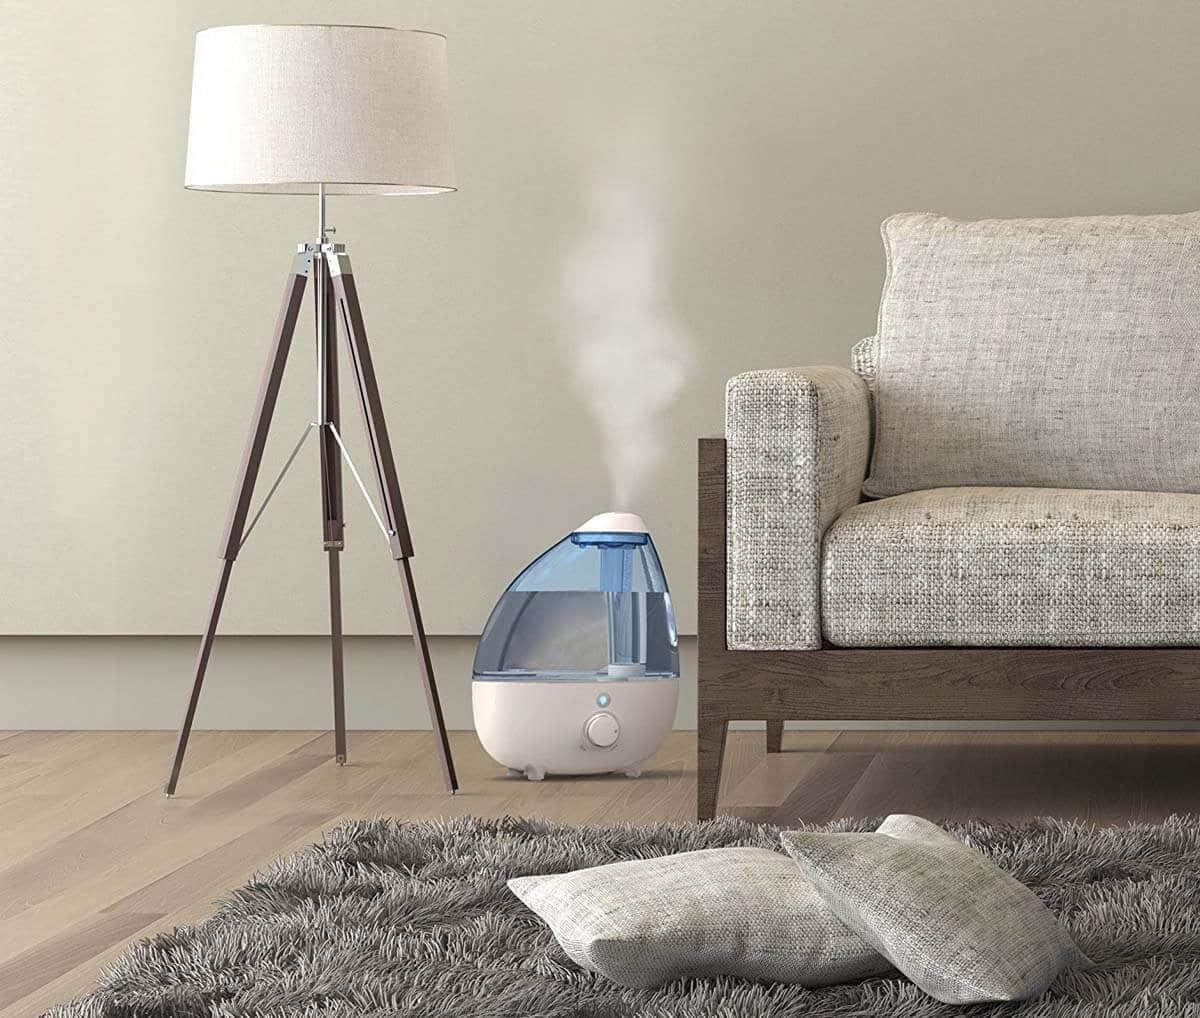 humidificador en casa